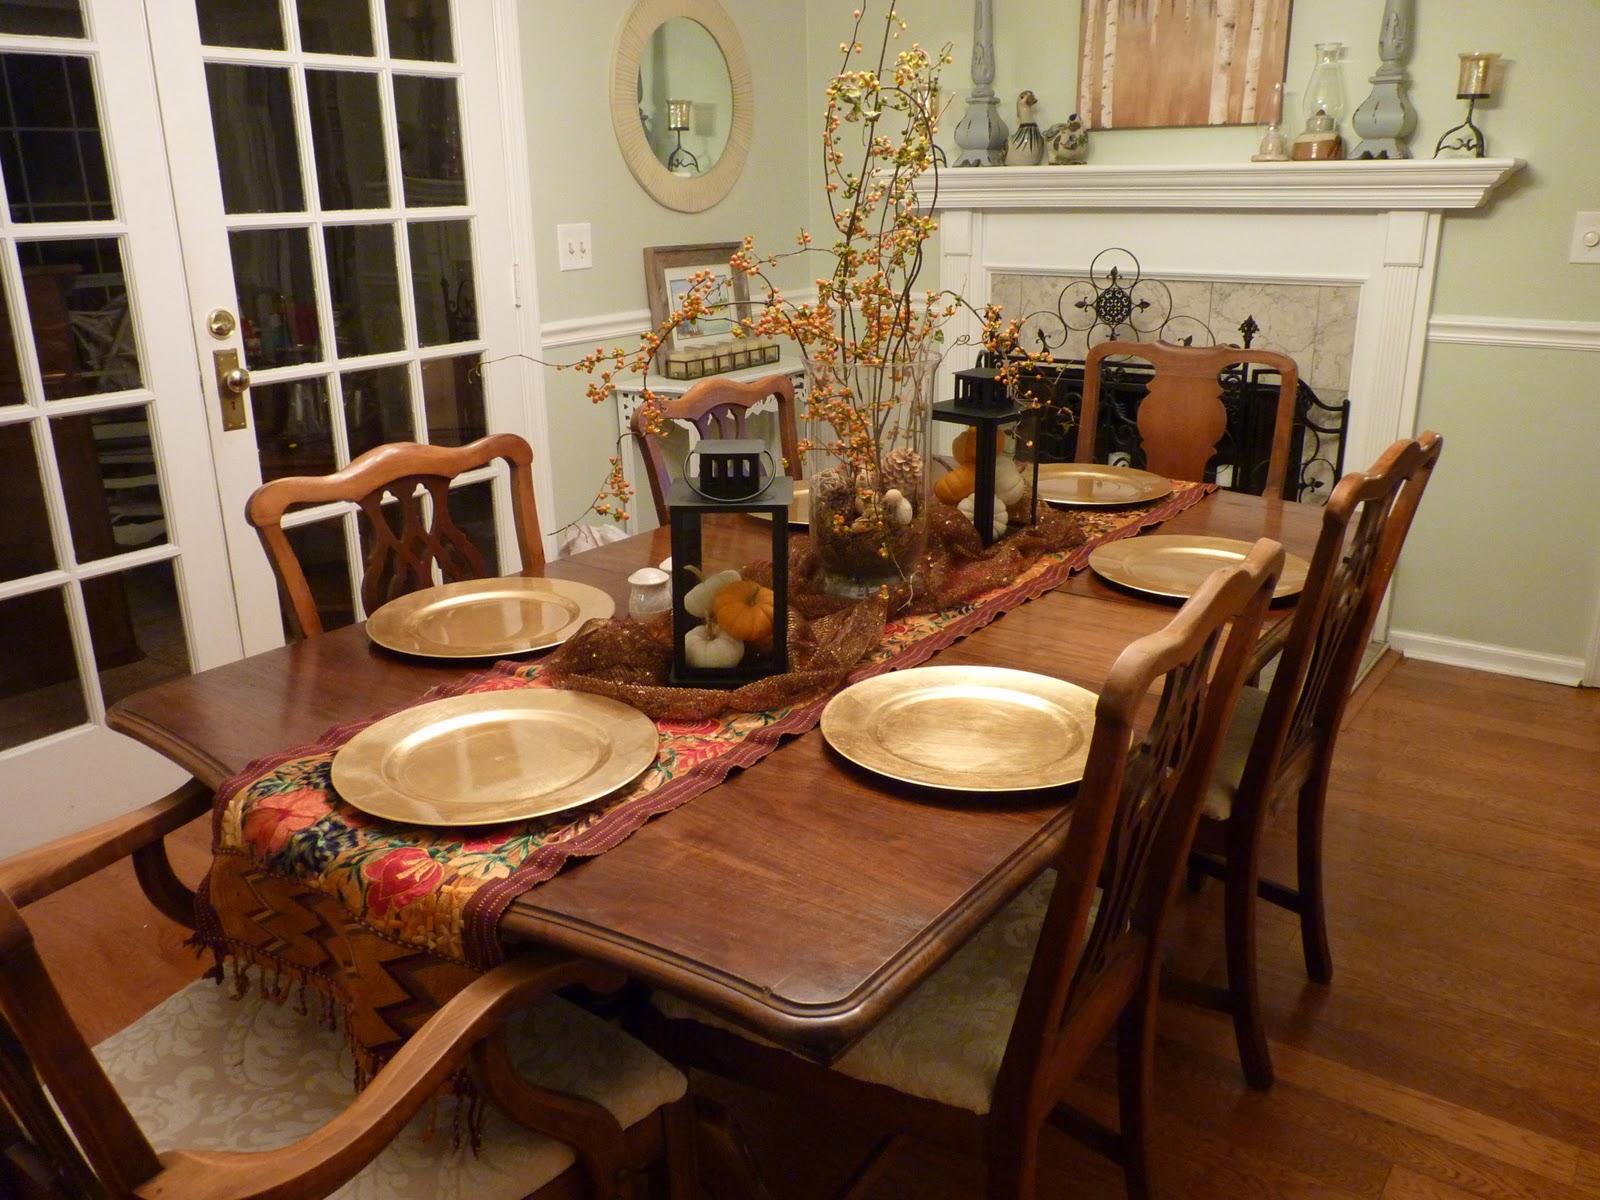 kitchen table top decor ideas - Kitchen Table Decor